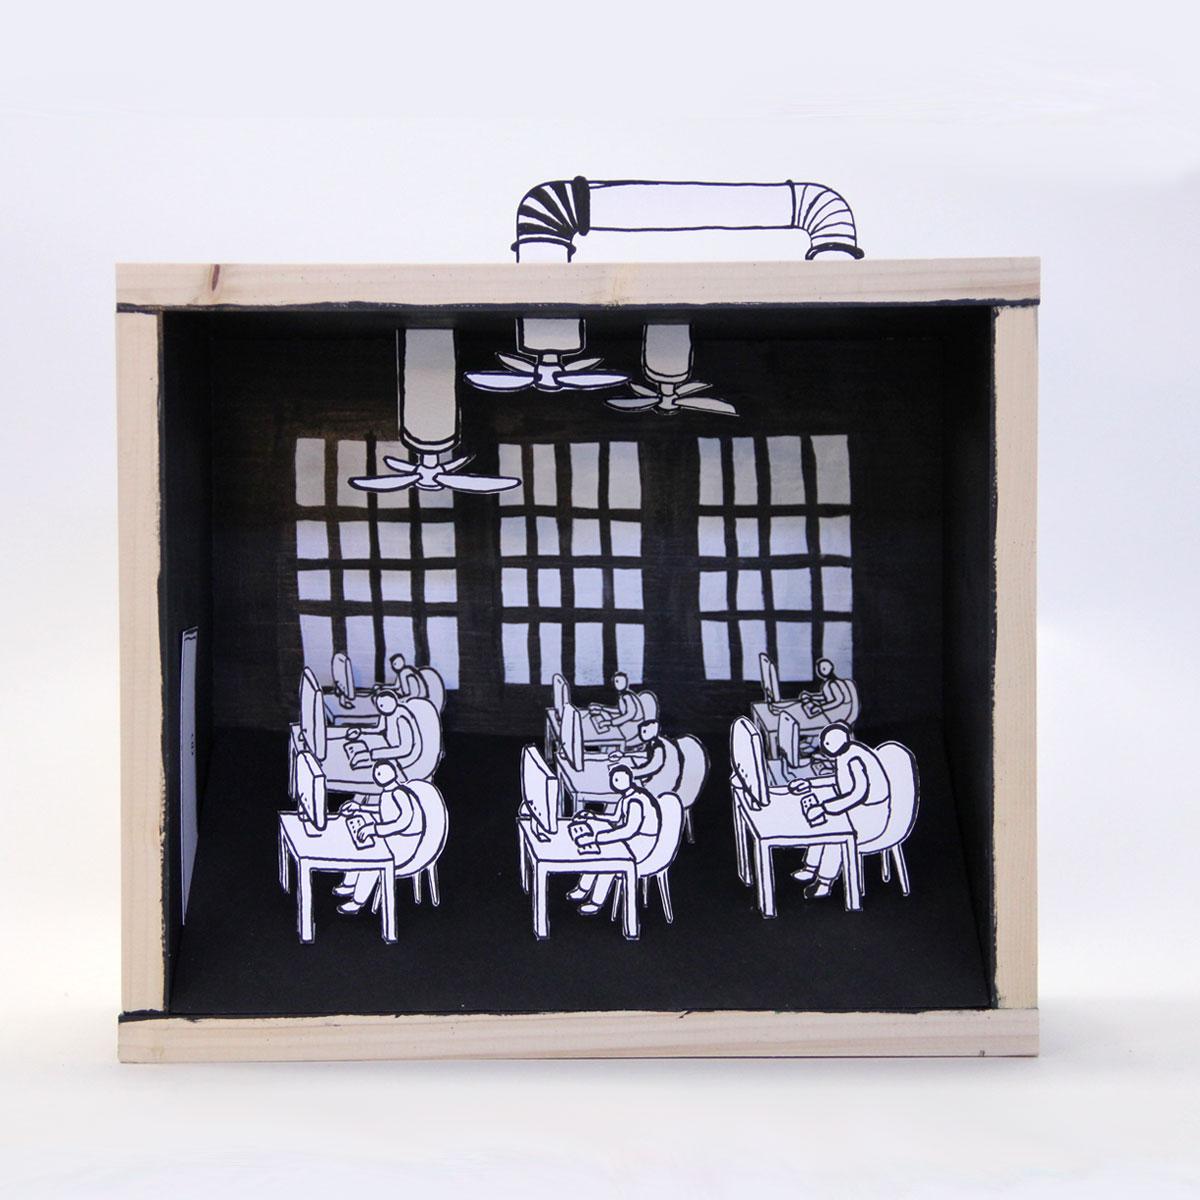 2016_Papercut_3D_Woodbox_Coworking_Doro_Spiro